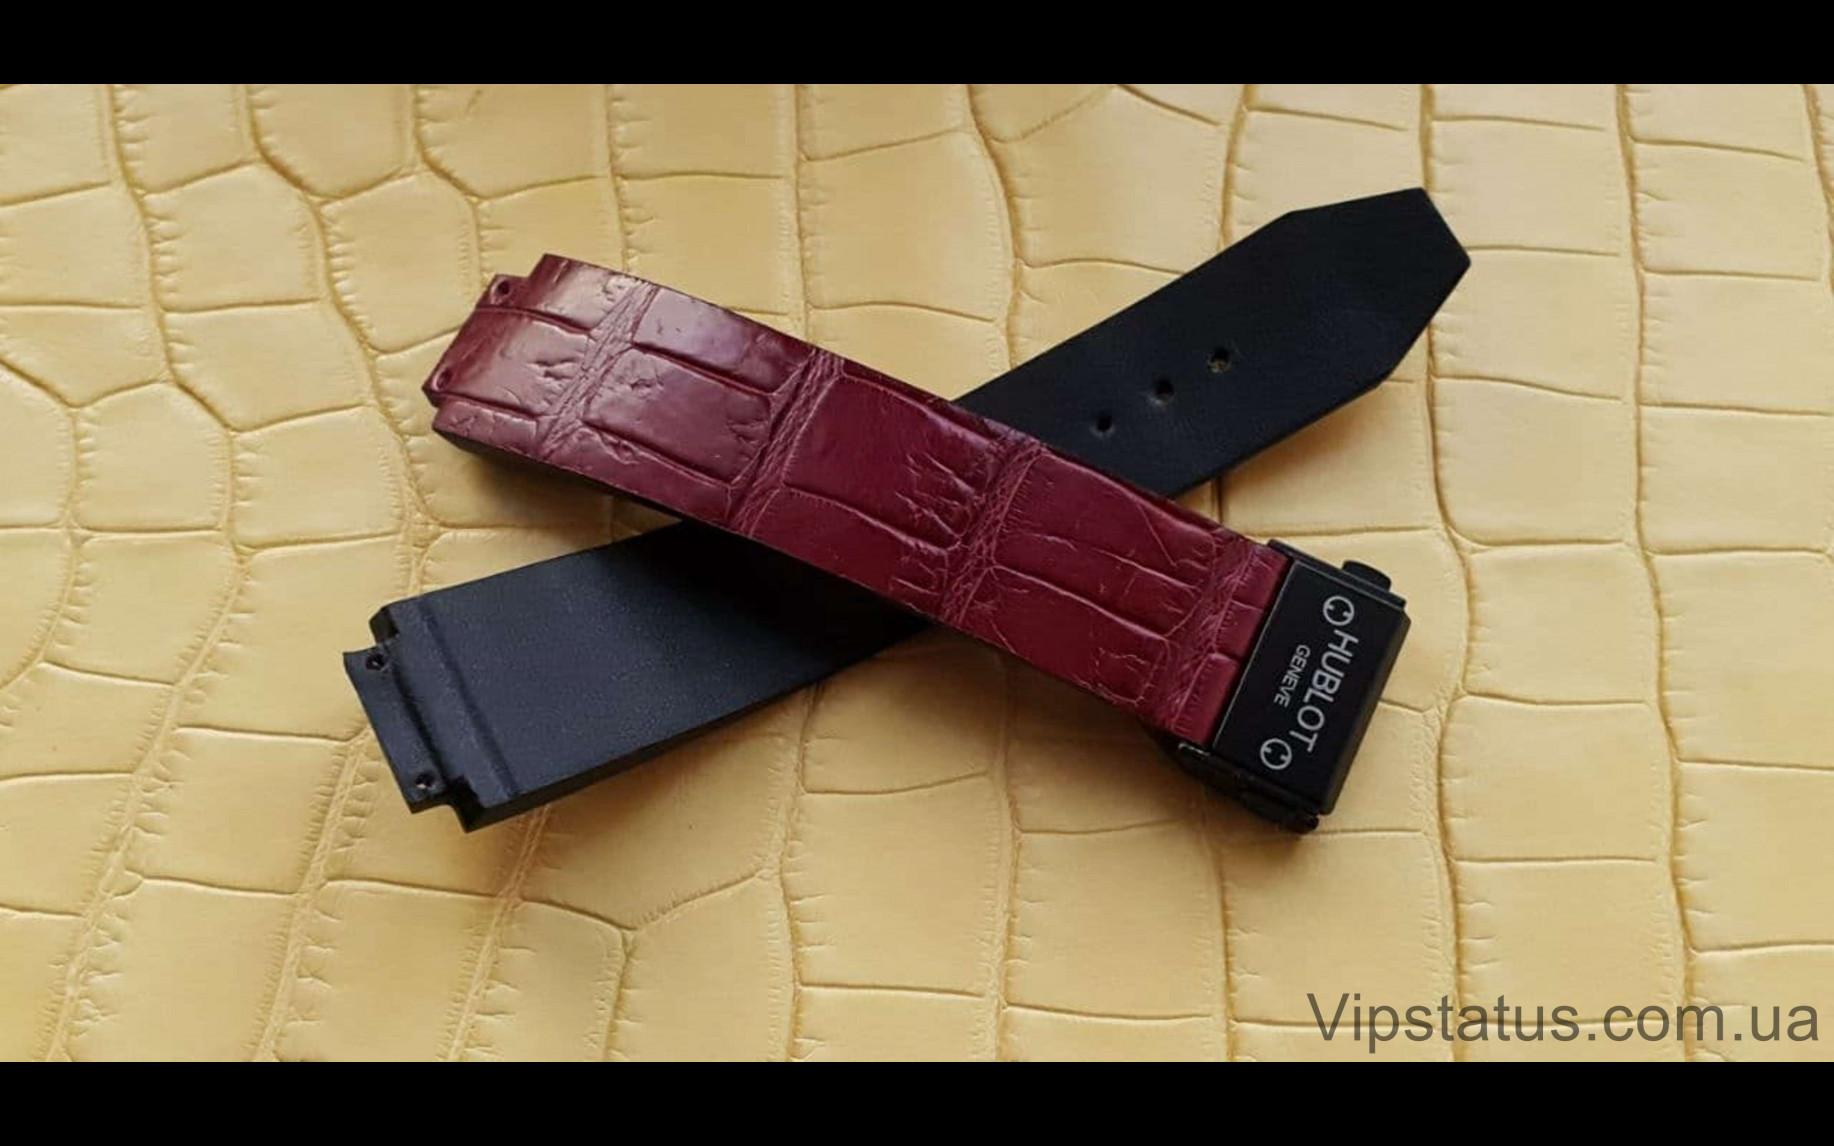 Elite Премиум ремешок для часов Hublot кожа крокодила Premium Crocodile Strap for Hublot watches image 3